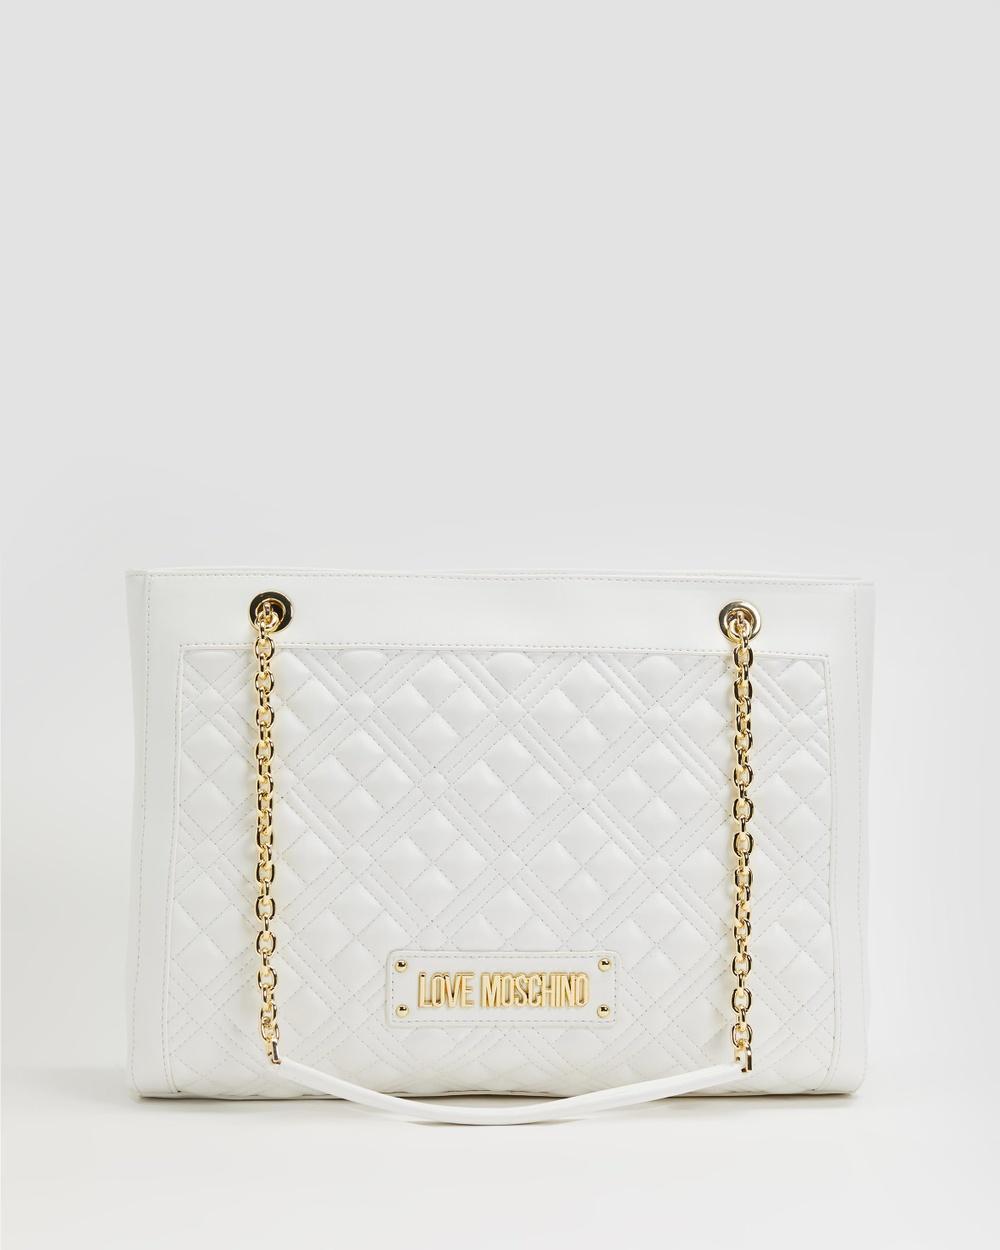 LOVE MOSCHINO Quilted Soft Rectangle Handbag Handbags Bianco